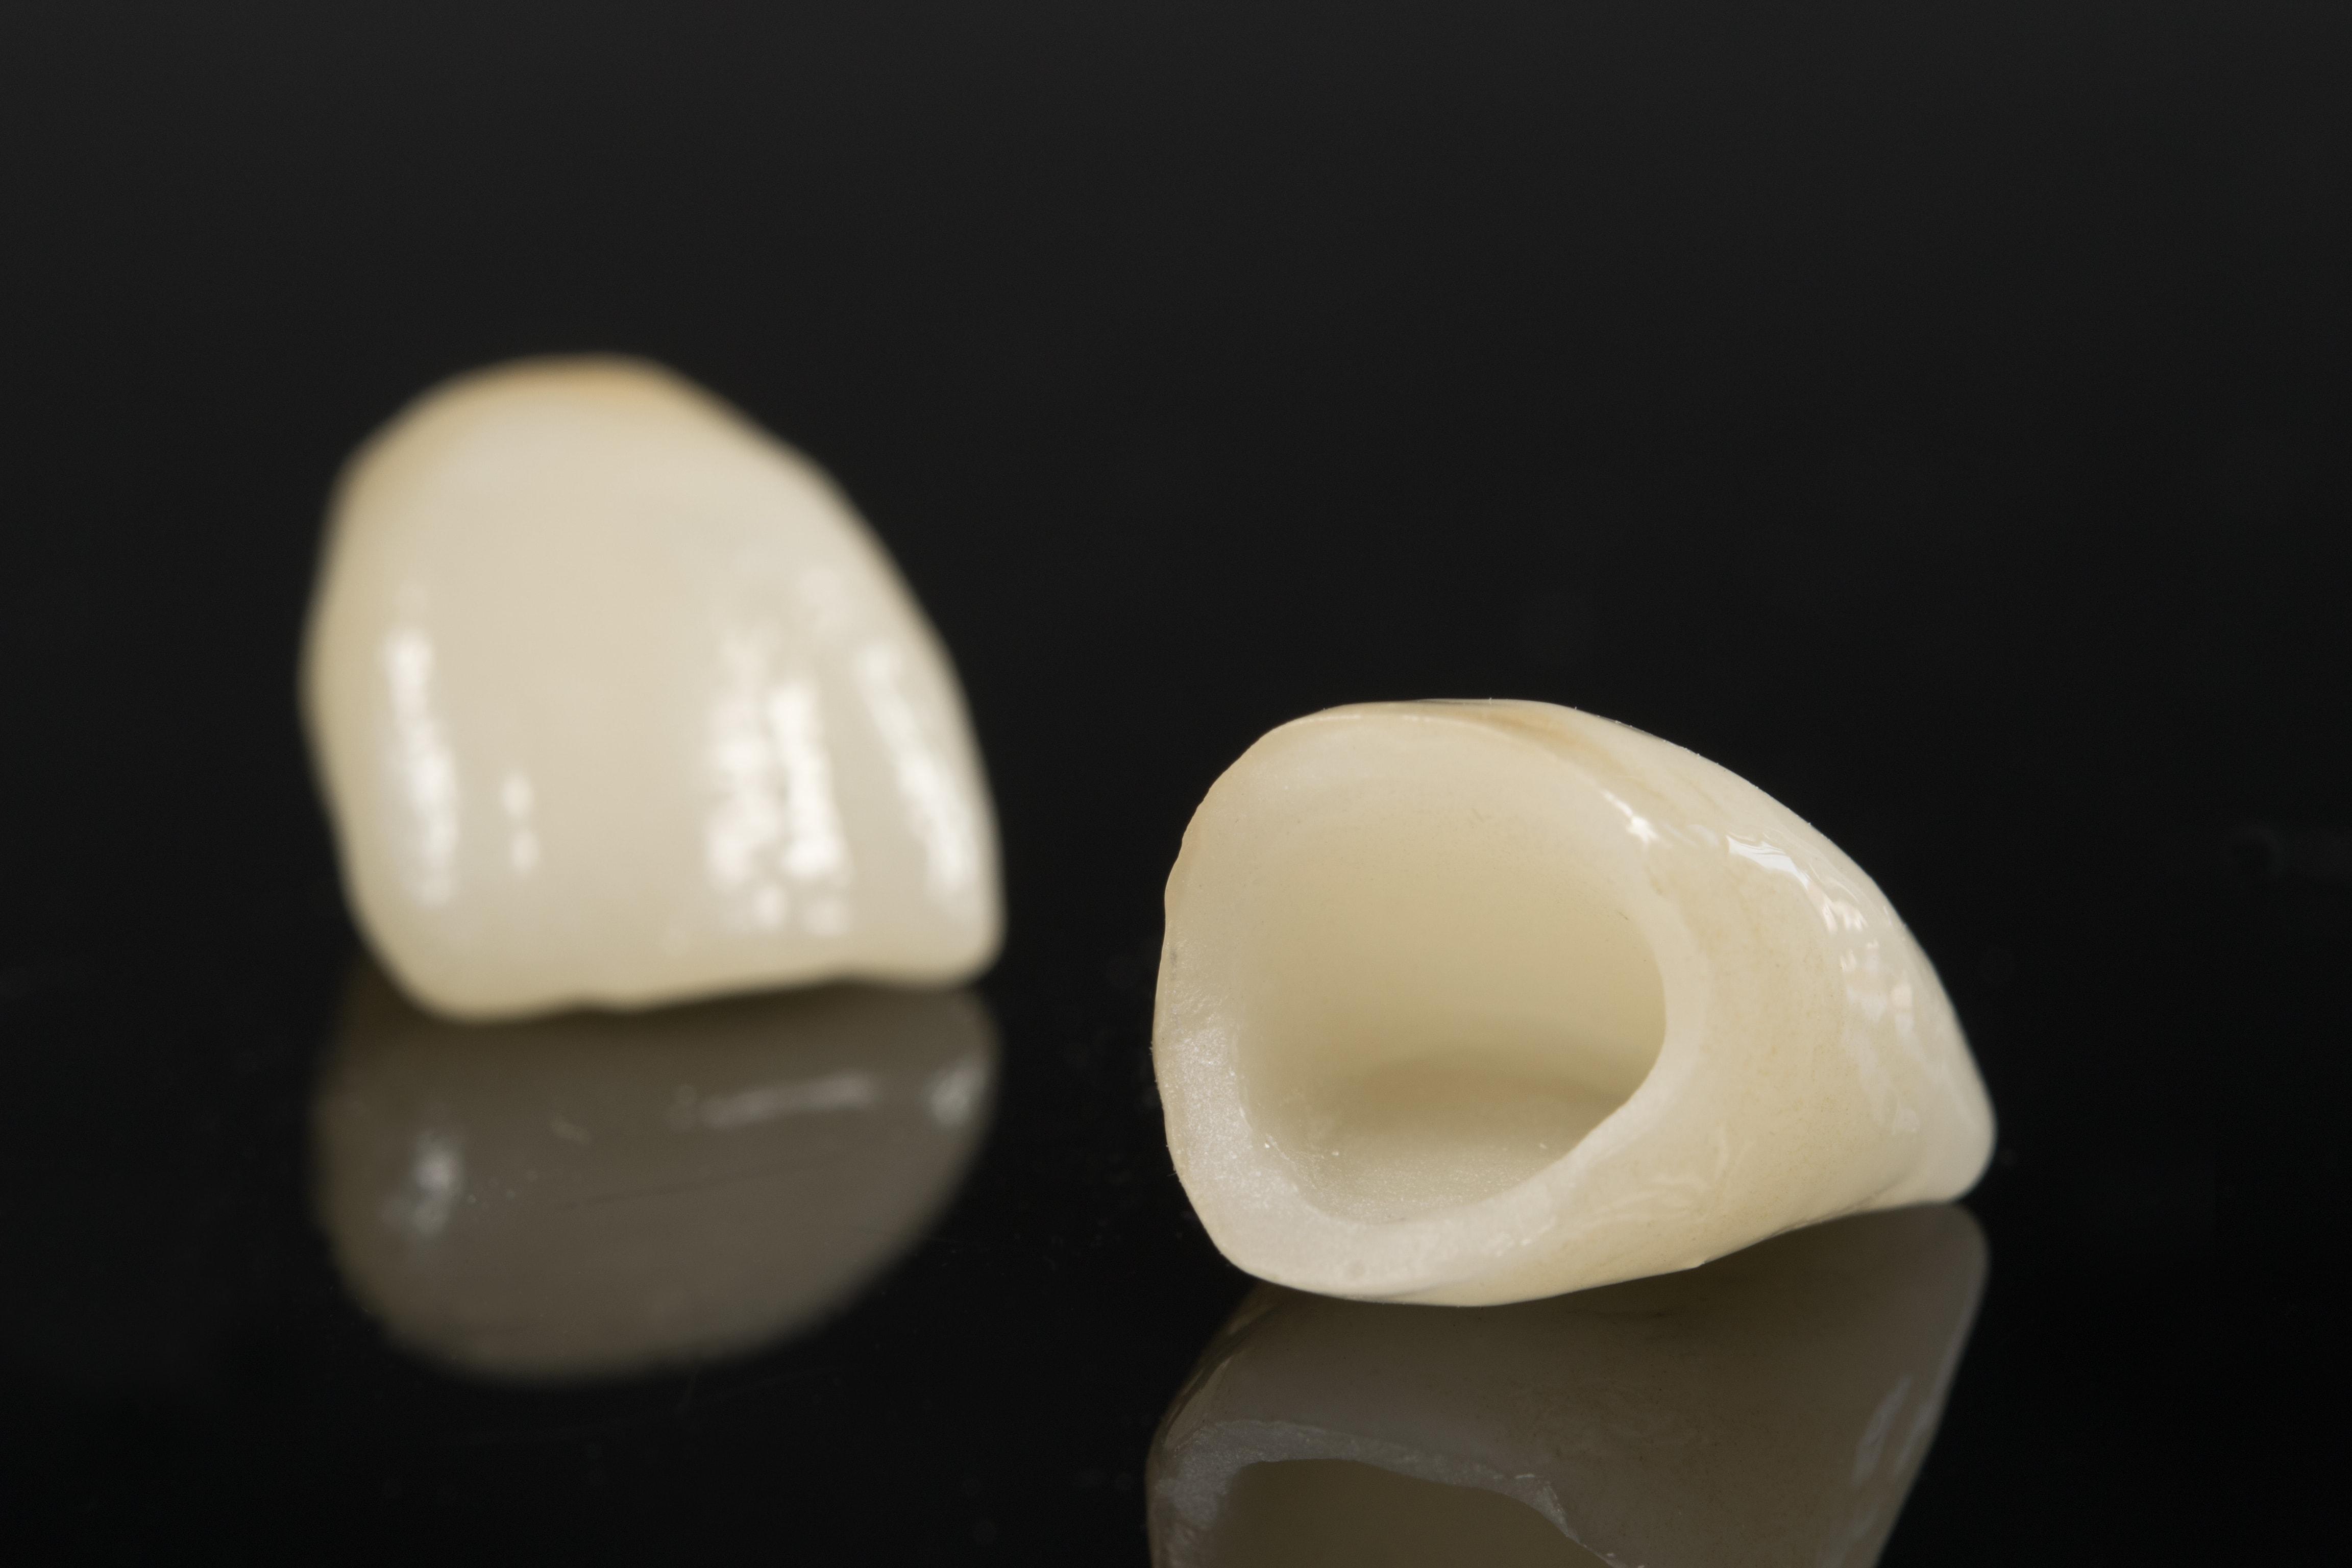 Dental Crowns | Benefits, Procedure Details amp Cost Info